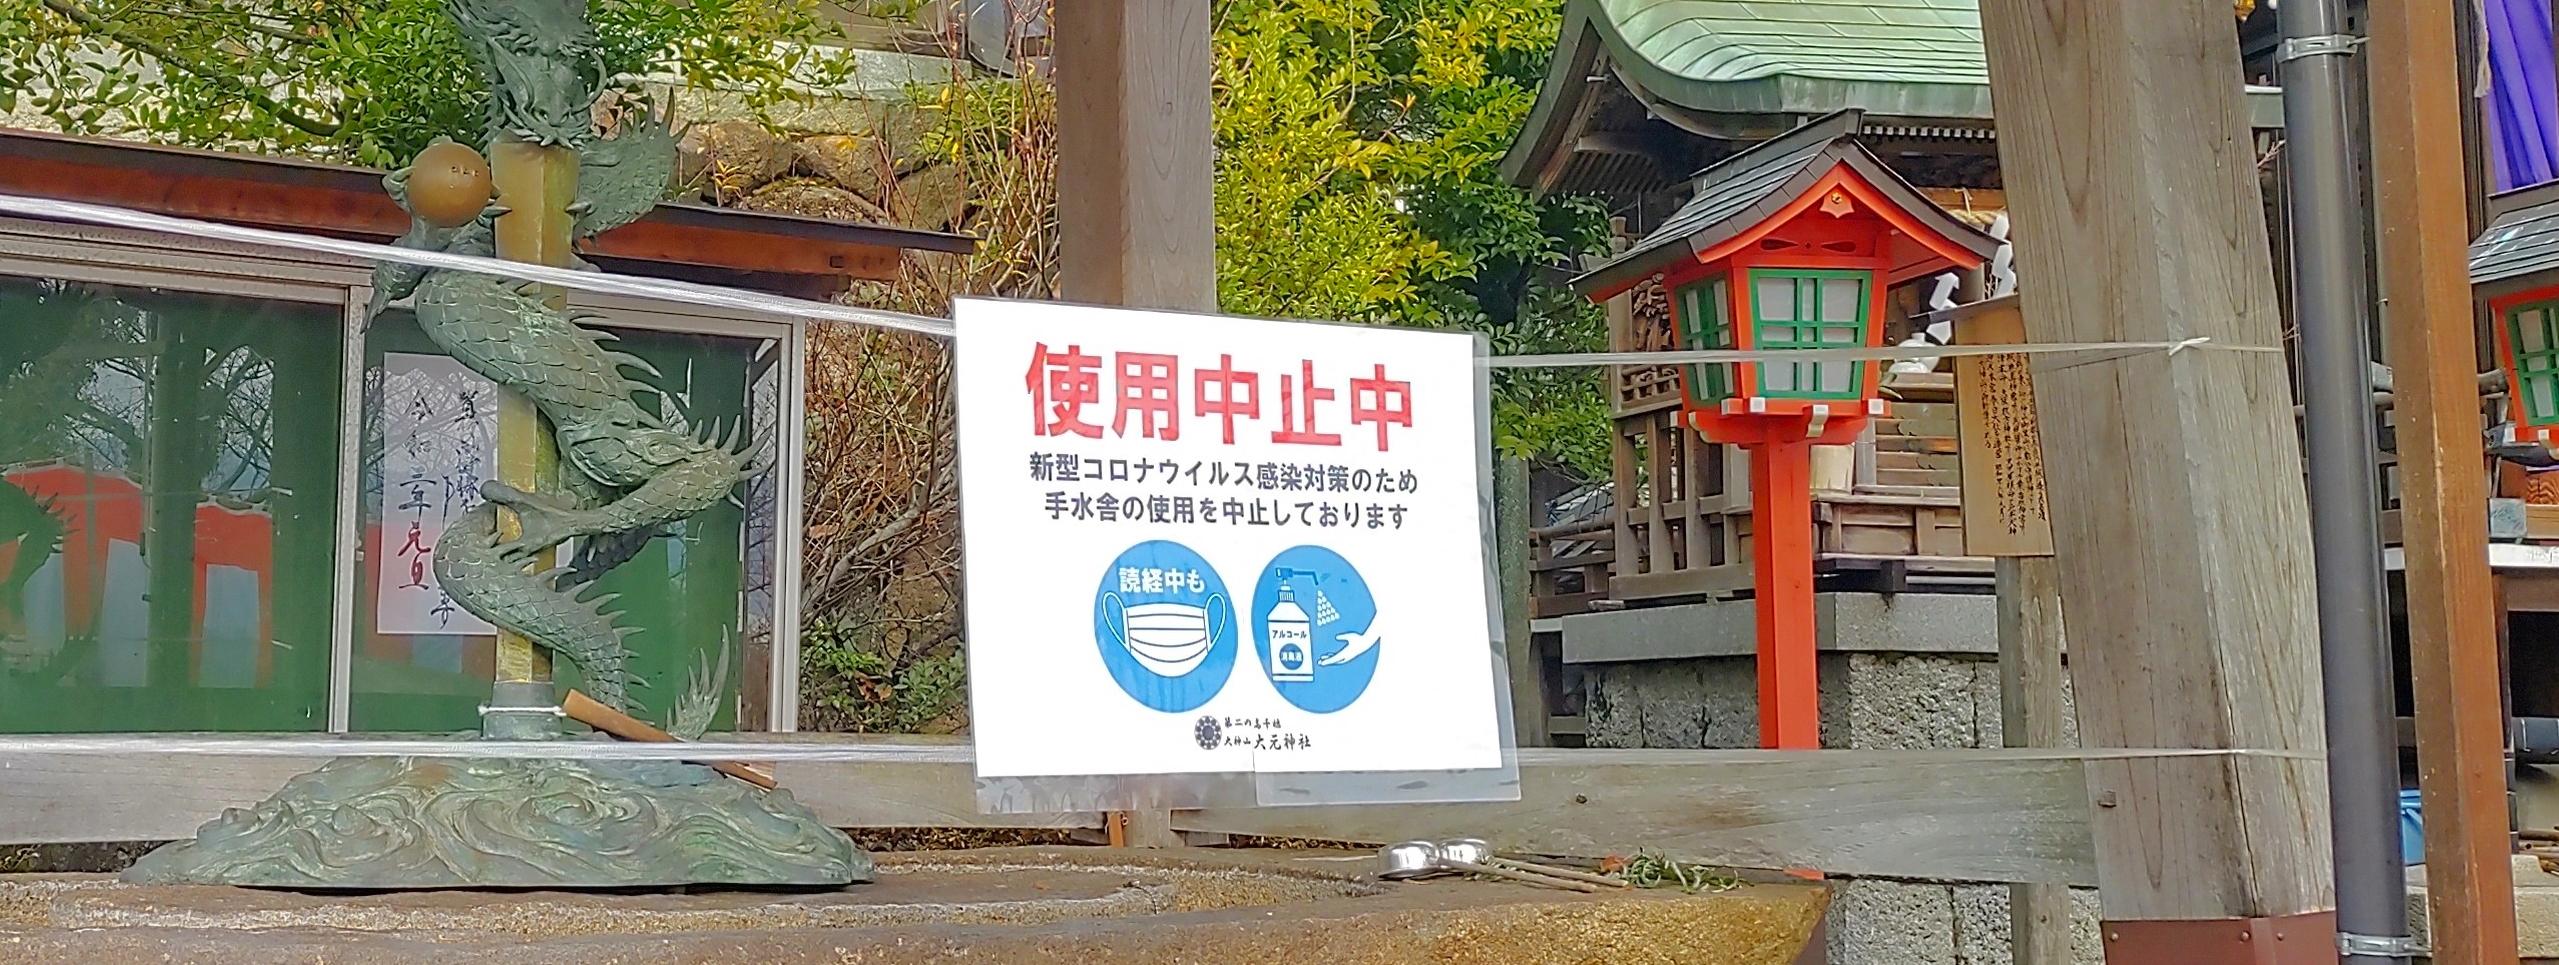 temizu_shiyouchuushi.jpg